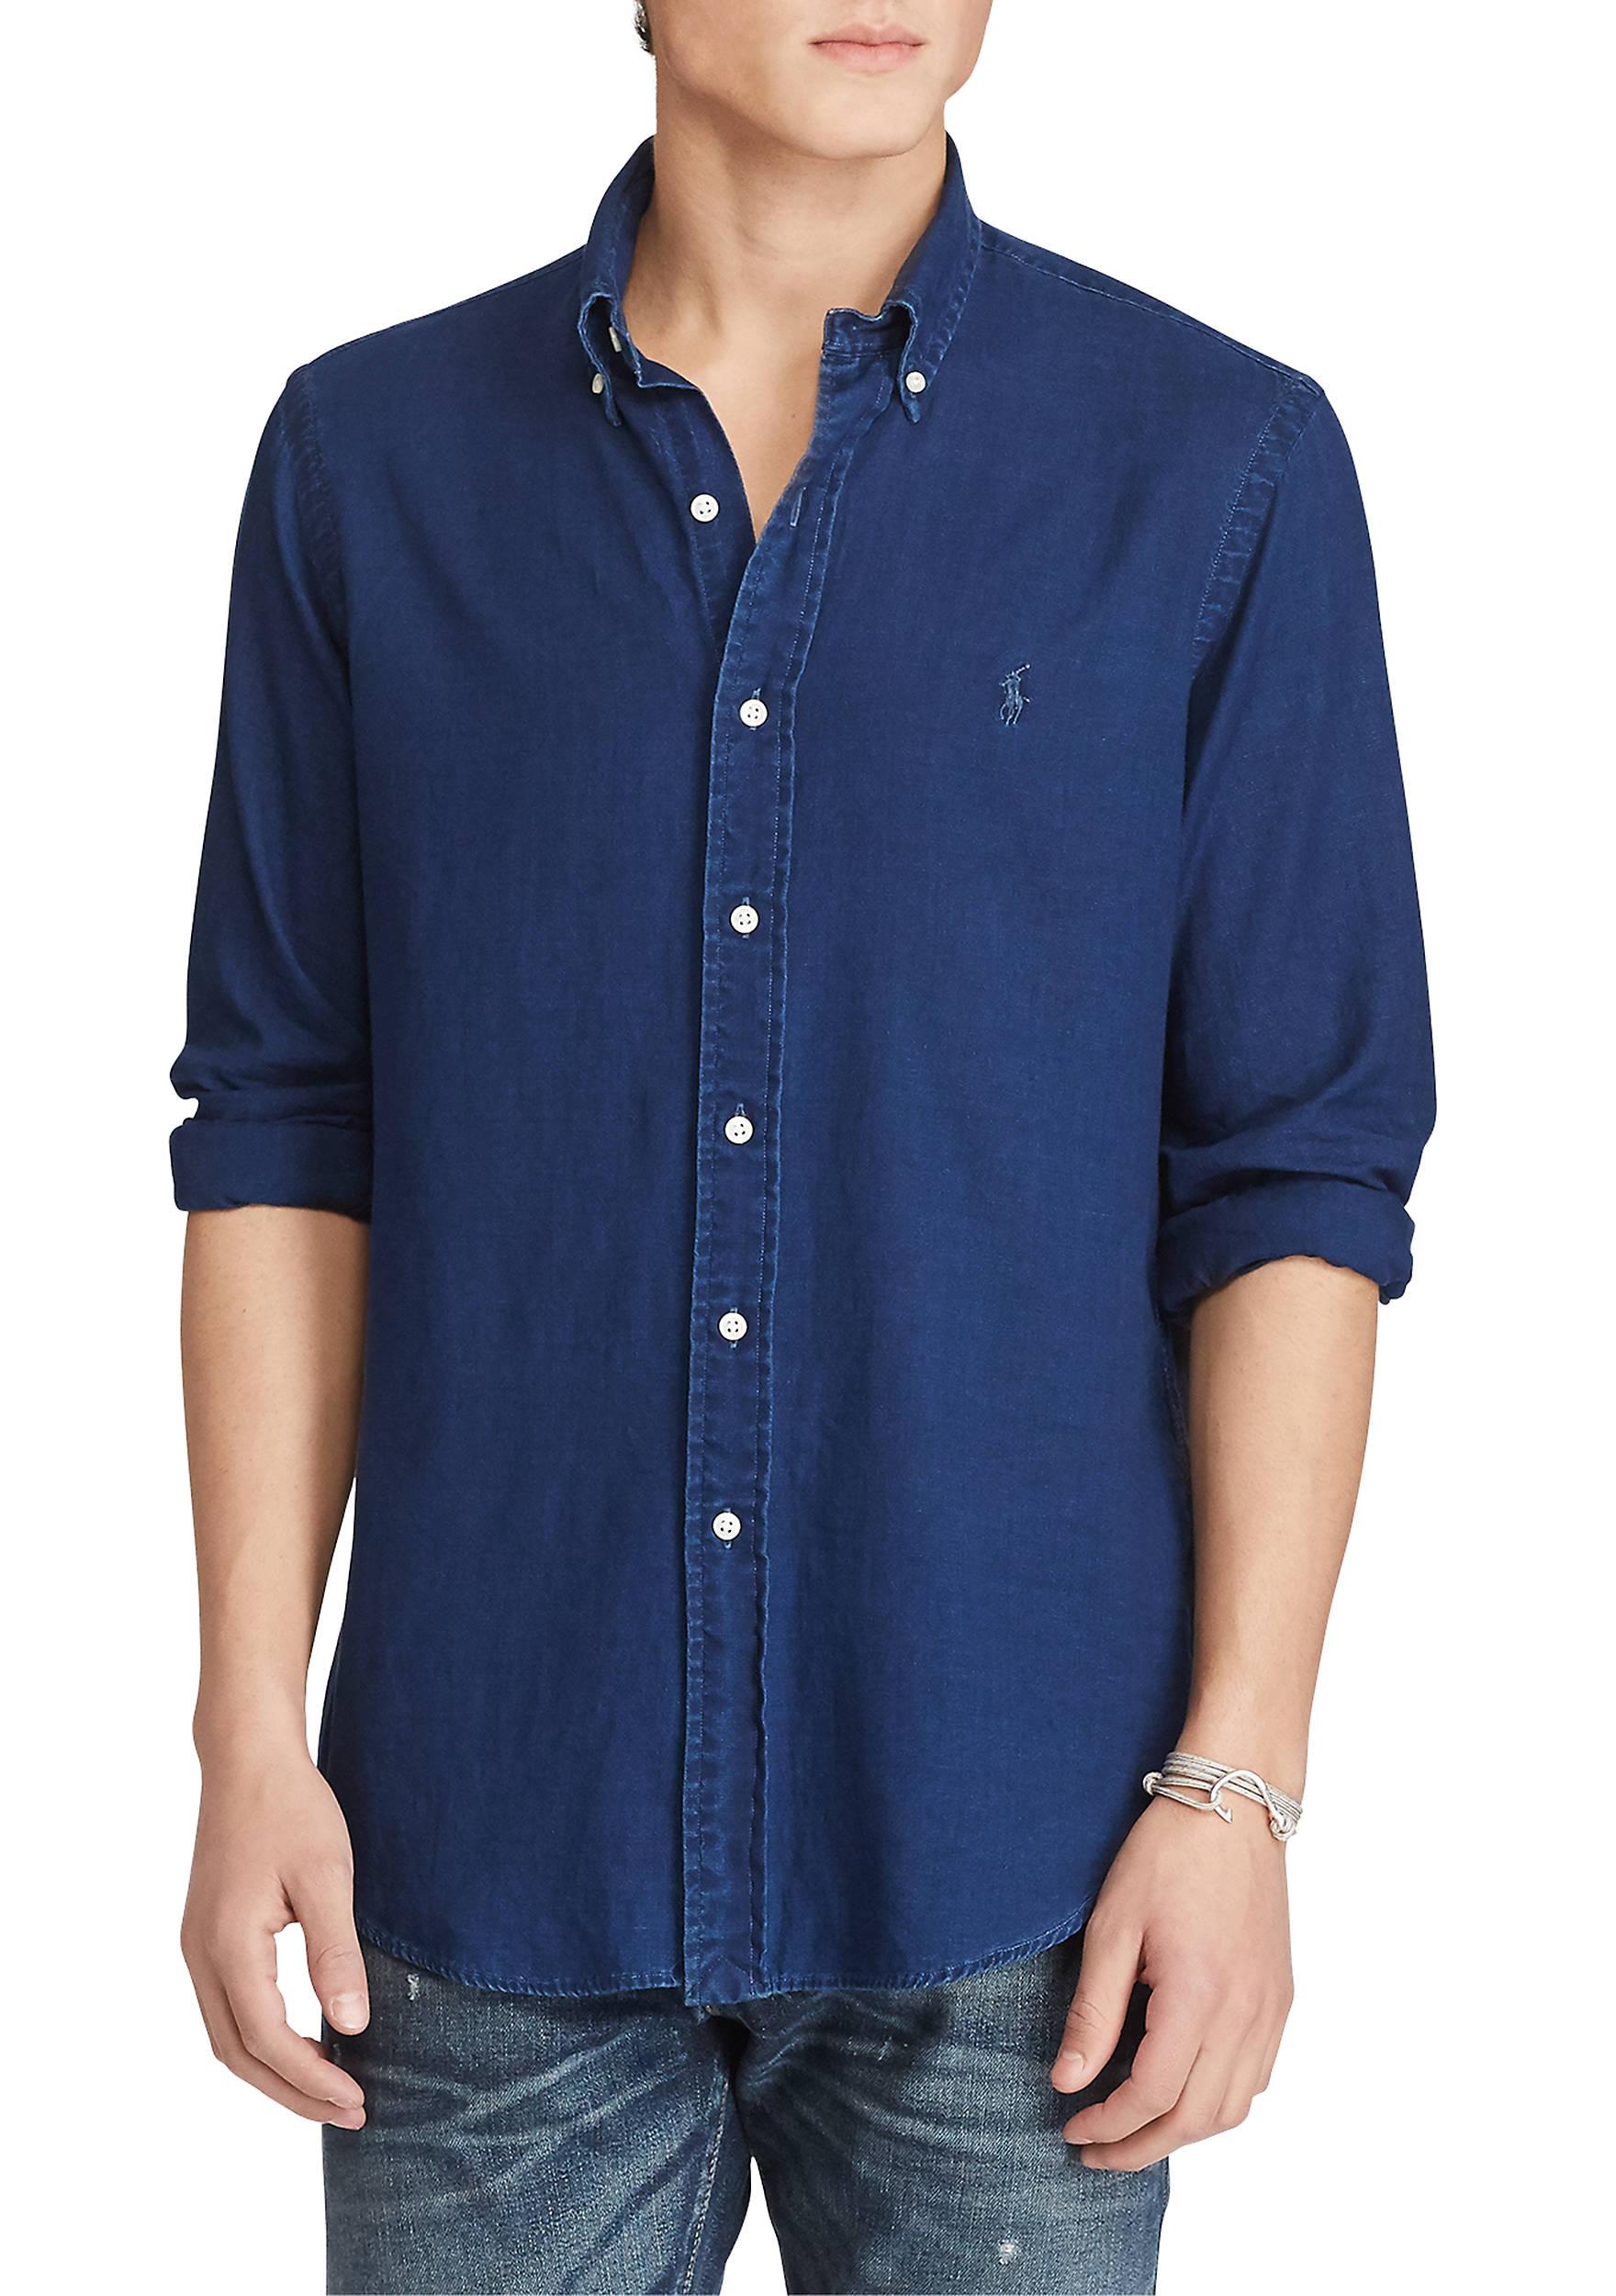 polo ralph lauren indigo cotton oxford shirt 3201602710653962001 images - Ralph Lauren Indigo